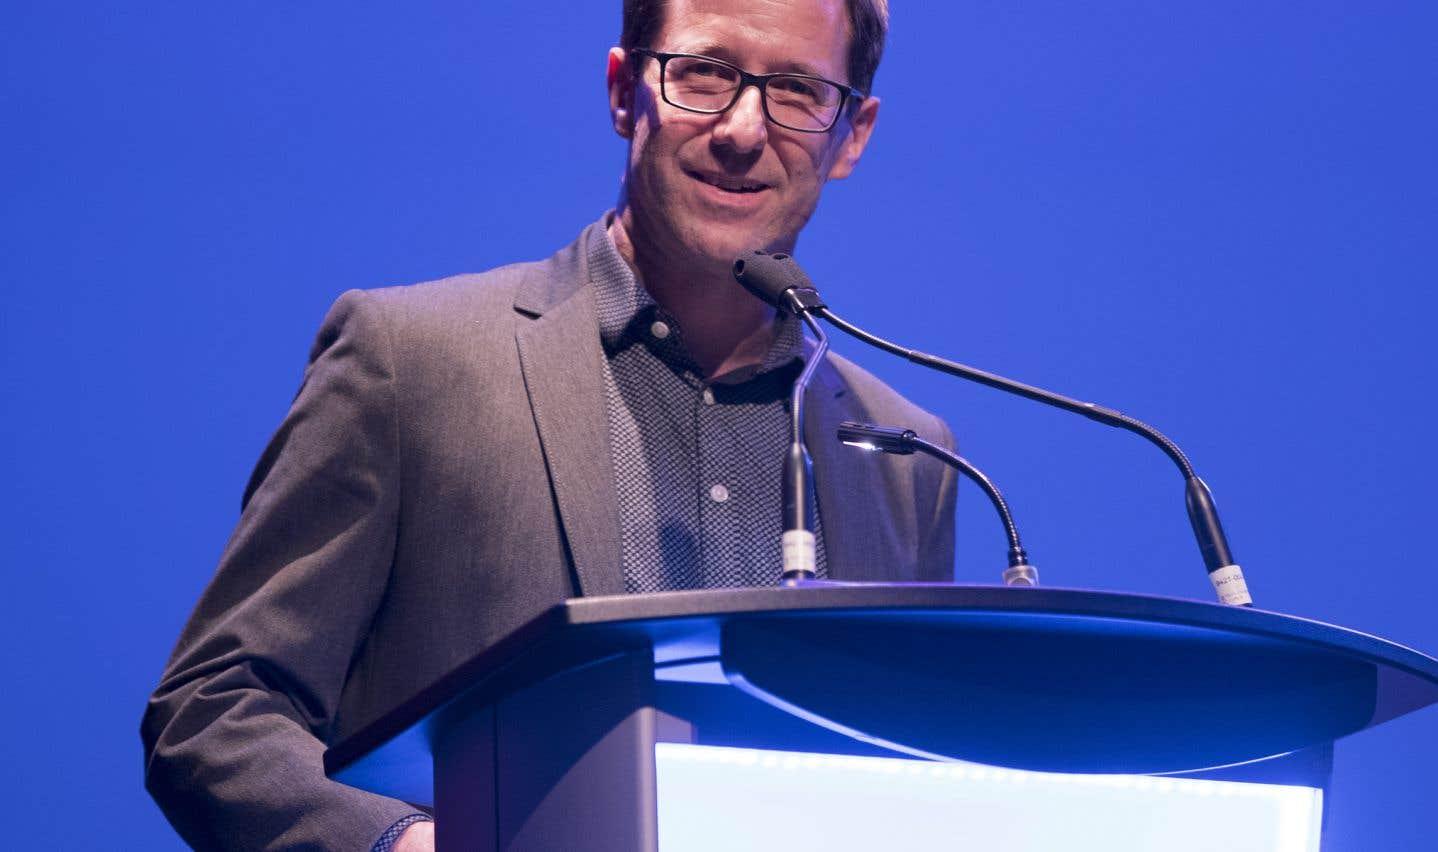 Le journaliste Marco Fortier